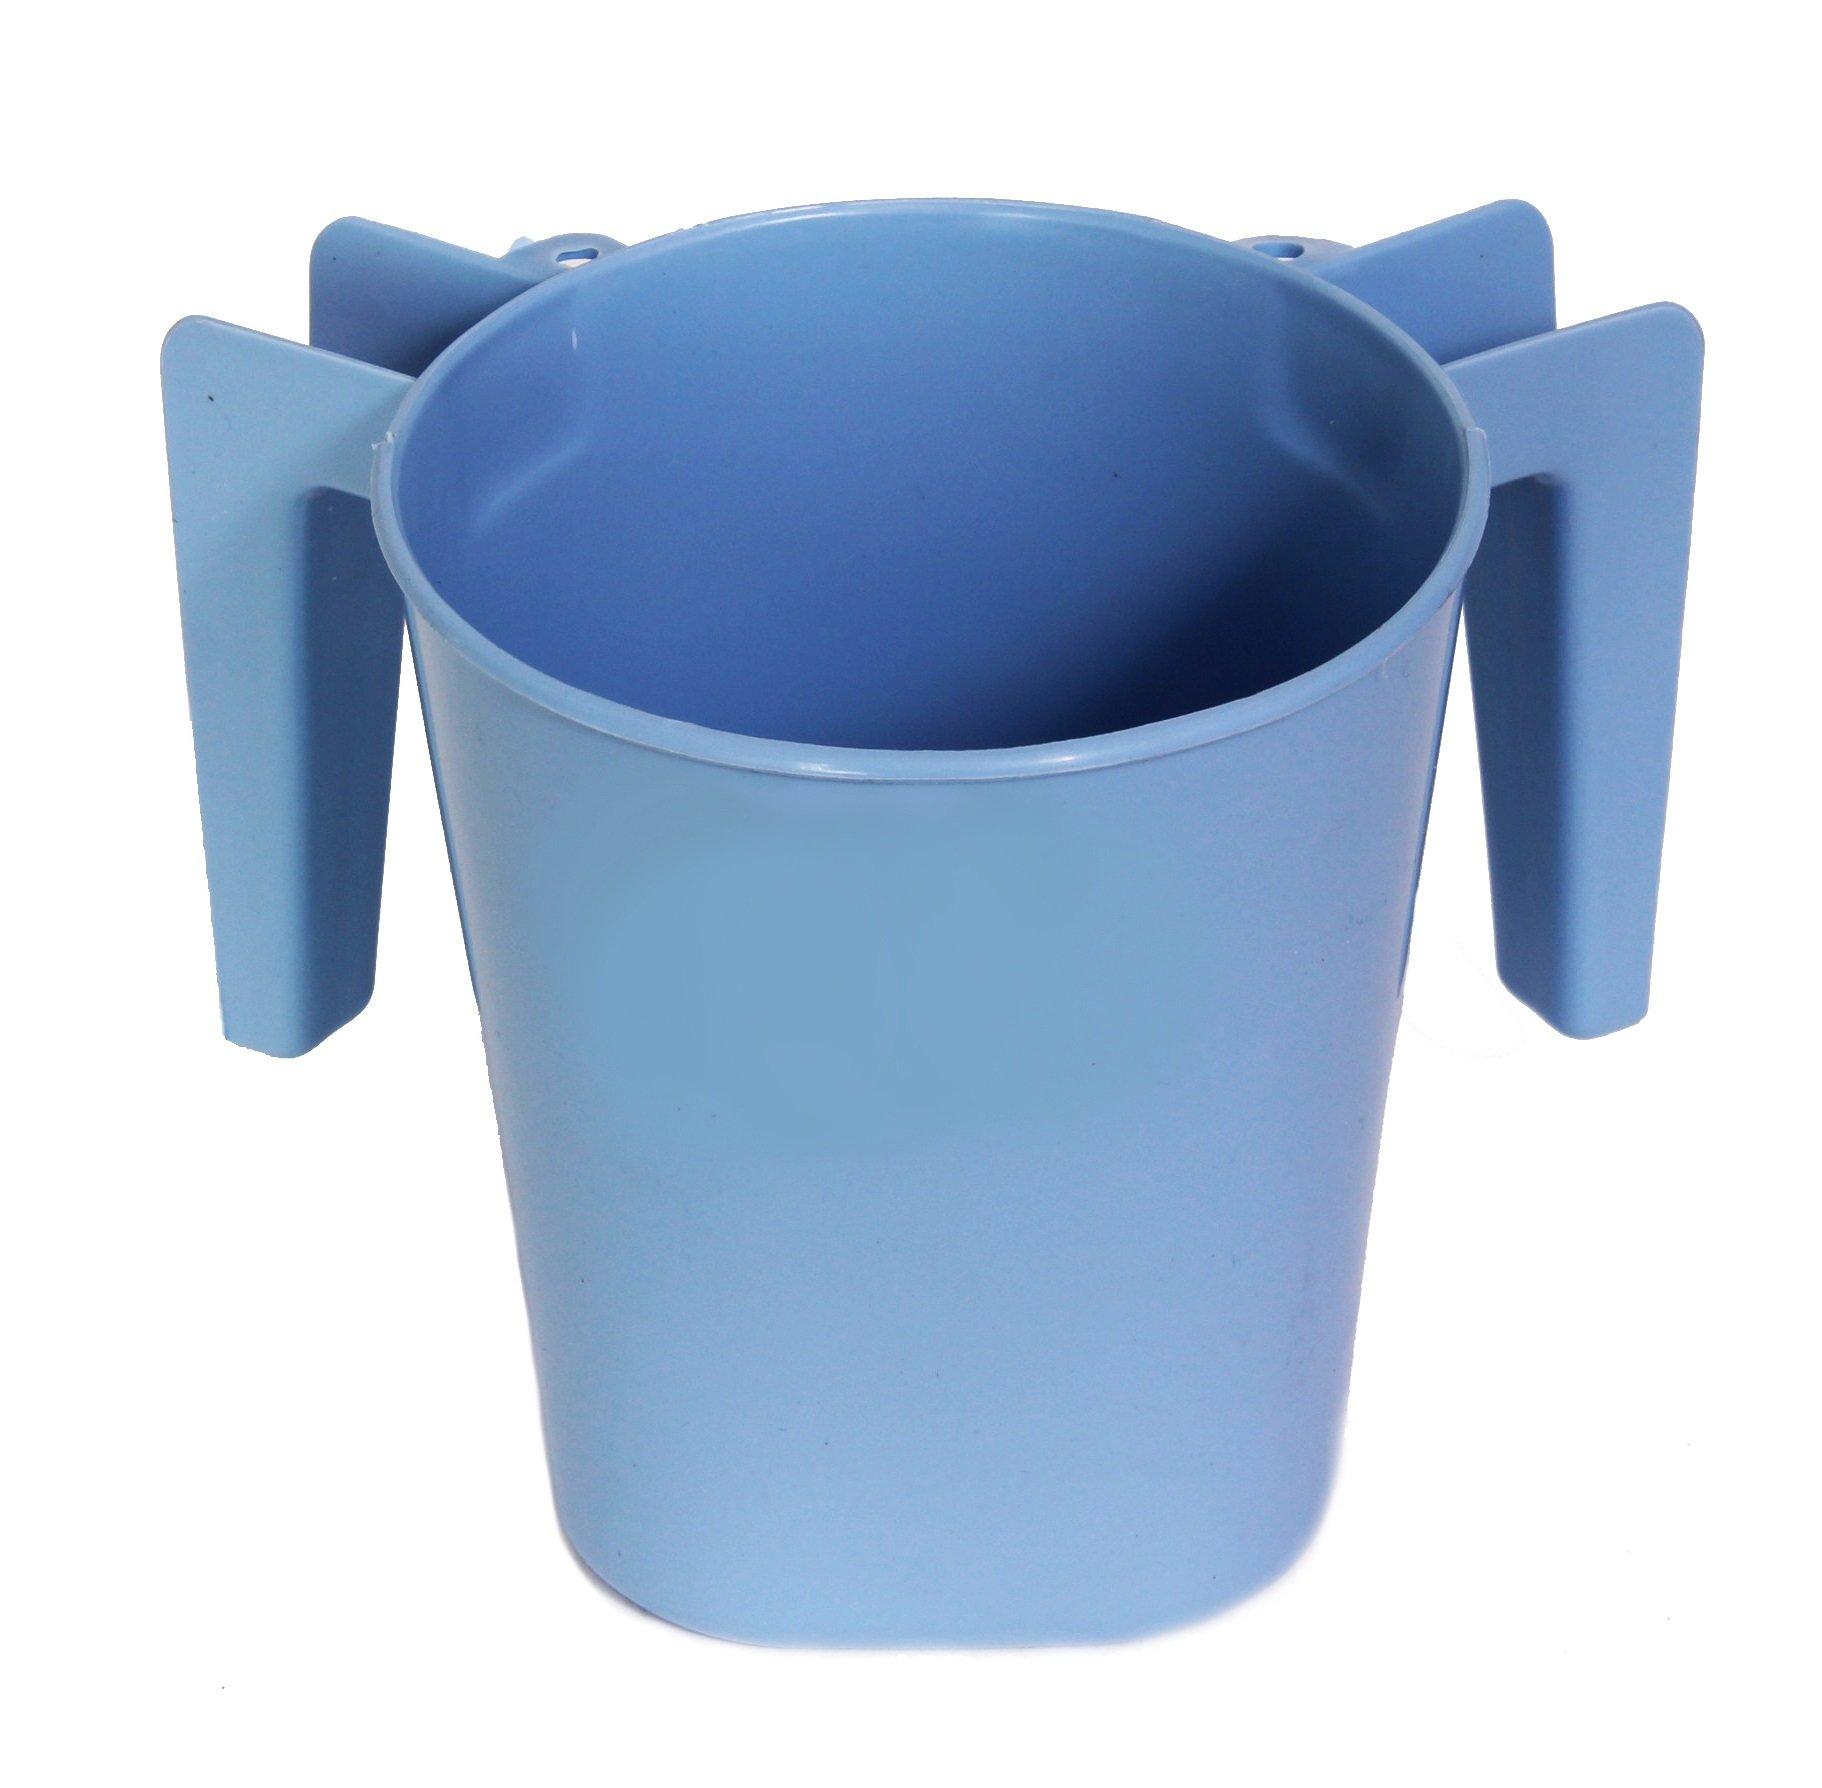 Ybm Home Plastic Square Wash Cup Ba154 (Light Blue, 4)